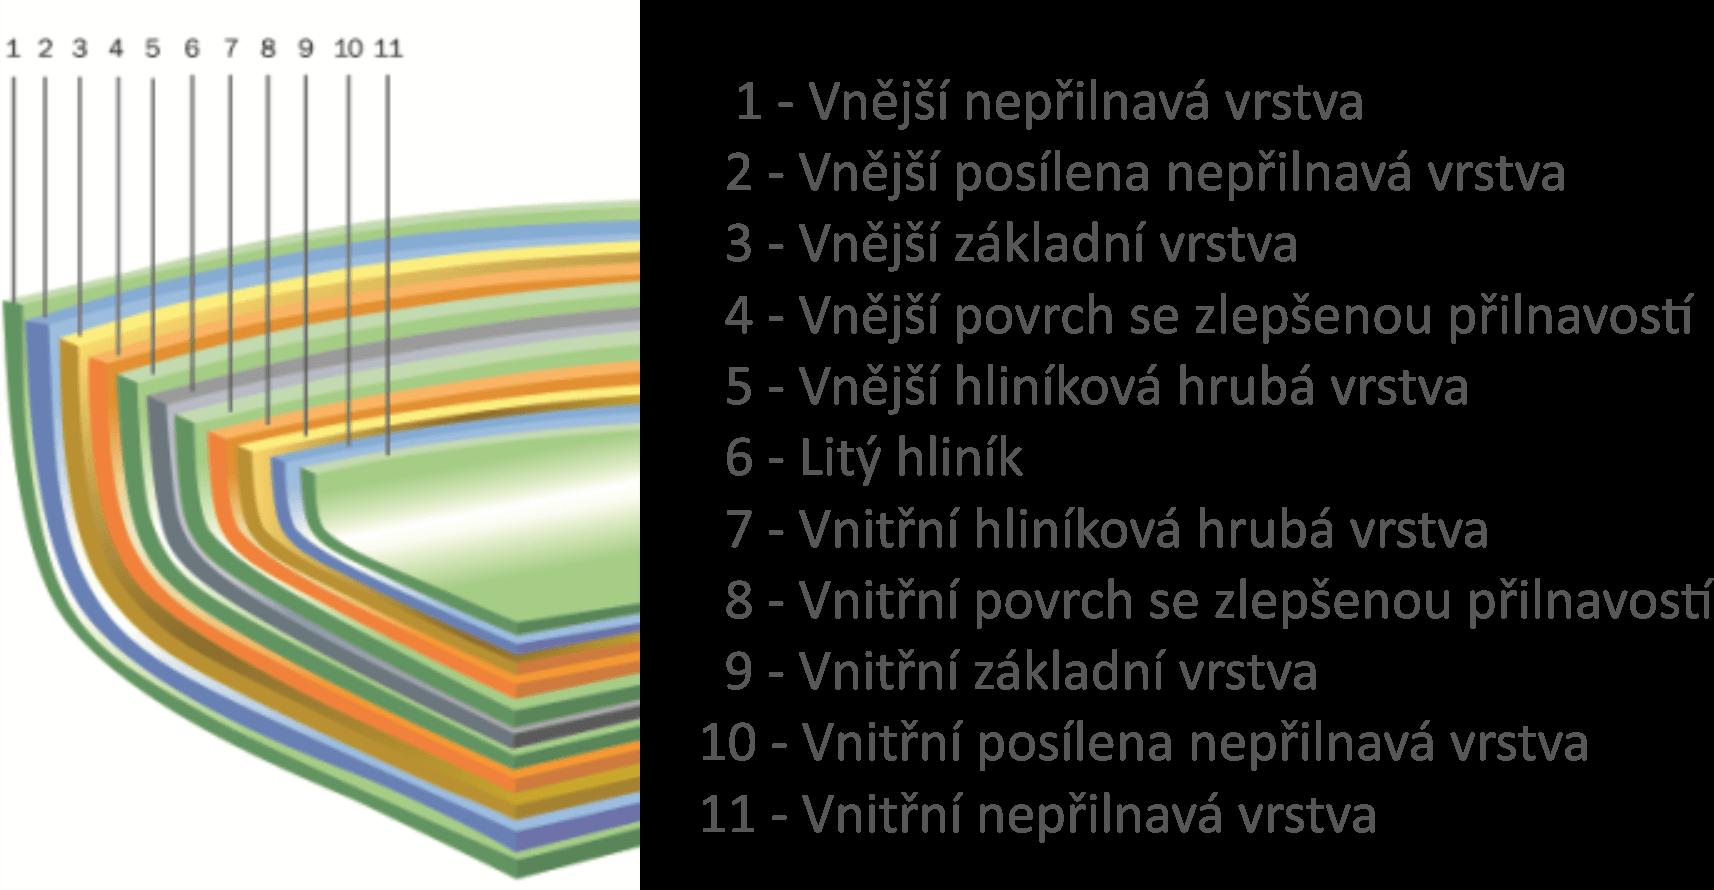 Vrstvy panve Napanvi